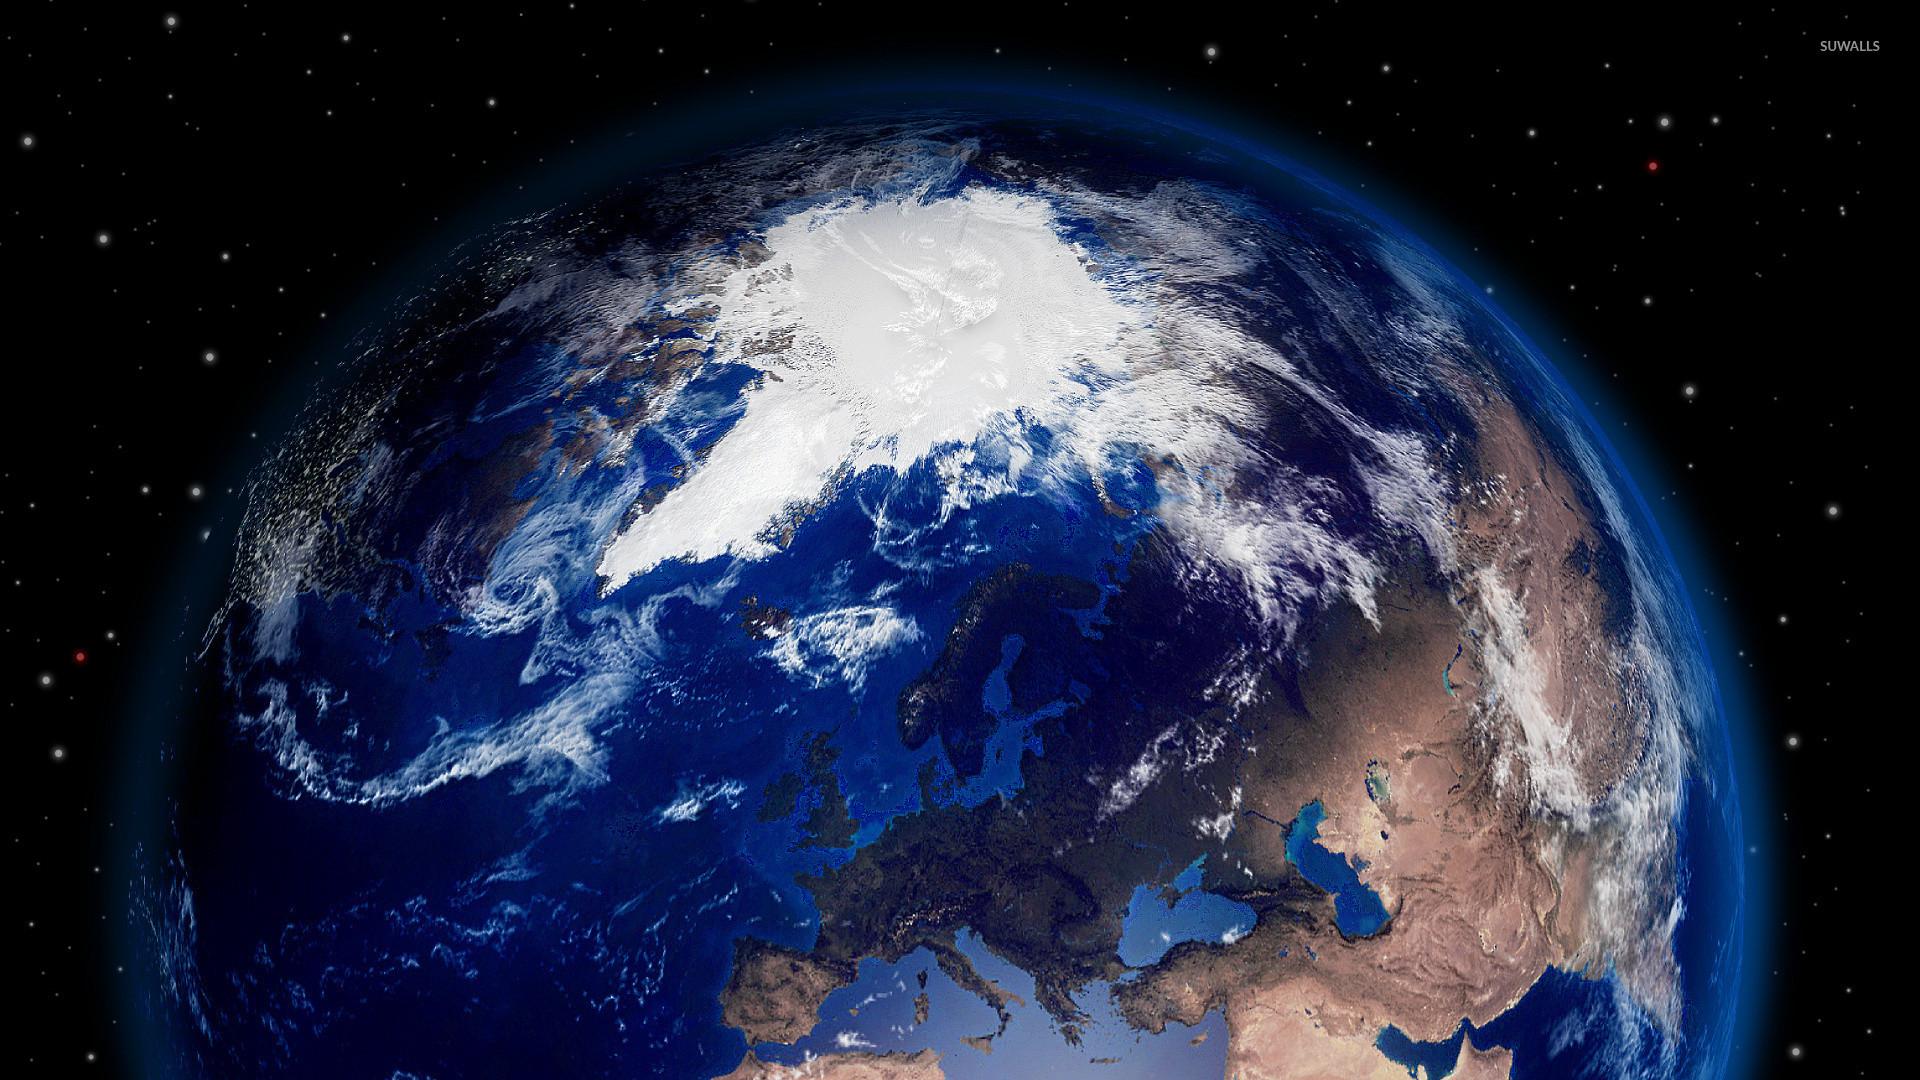 Earth between the stars wallpaper